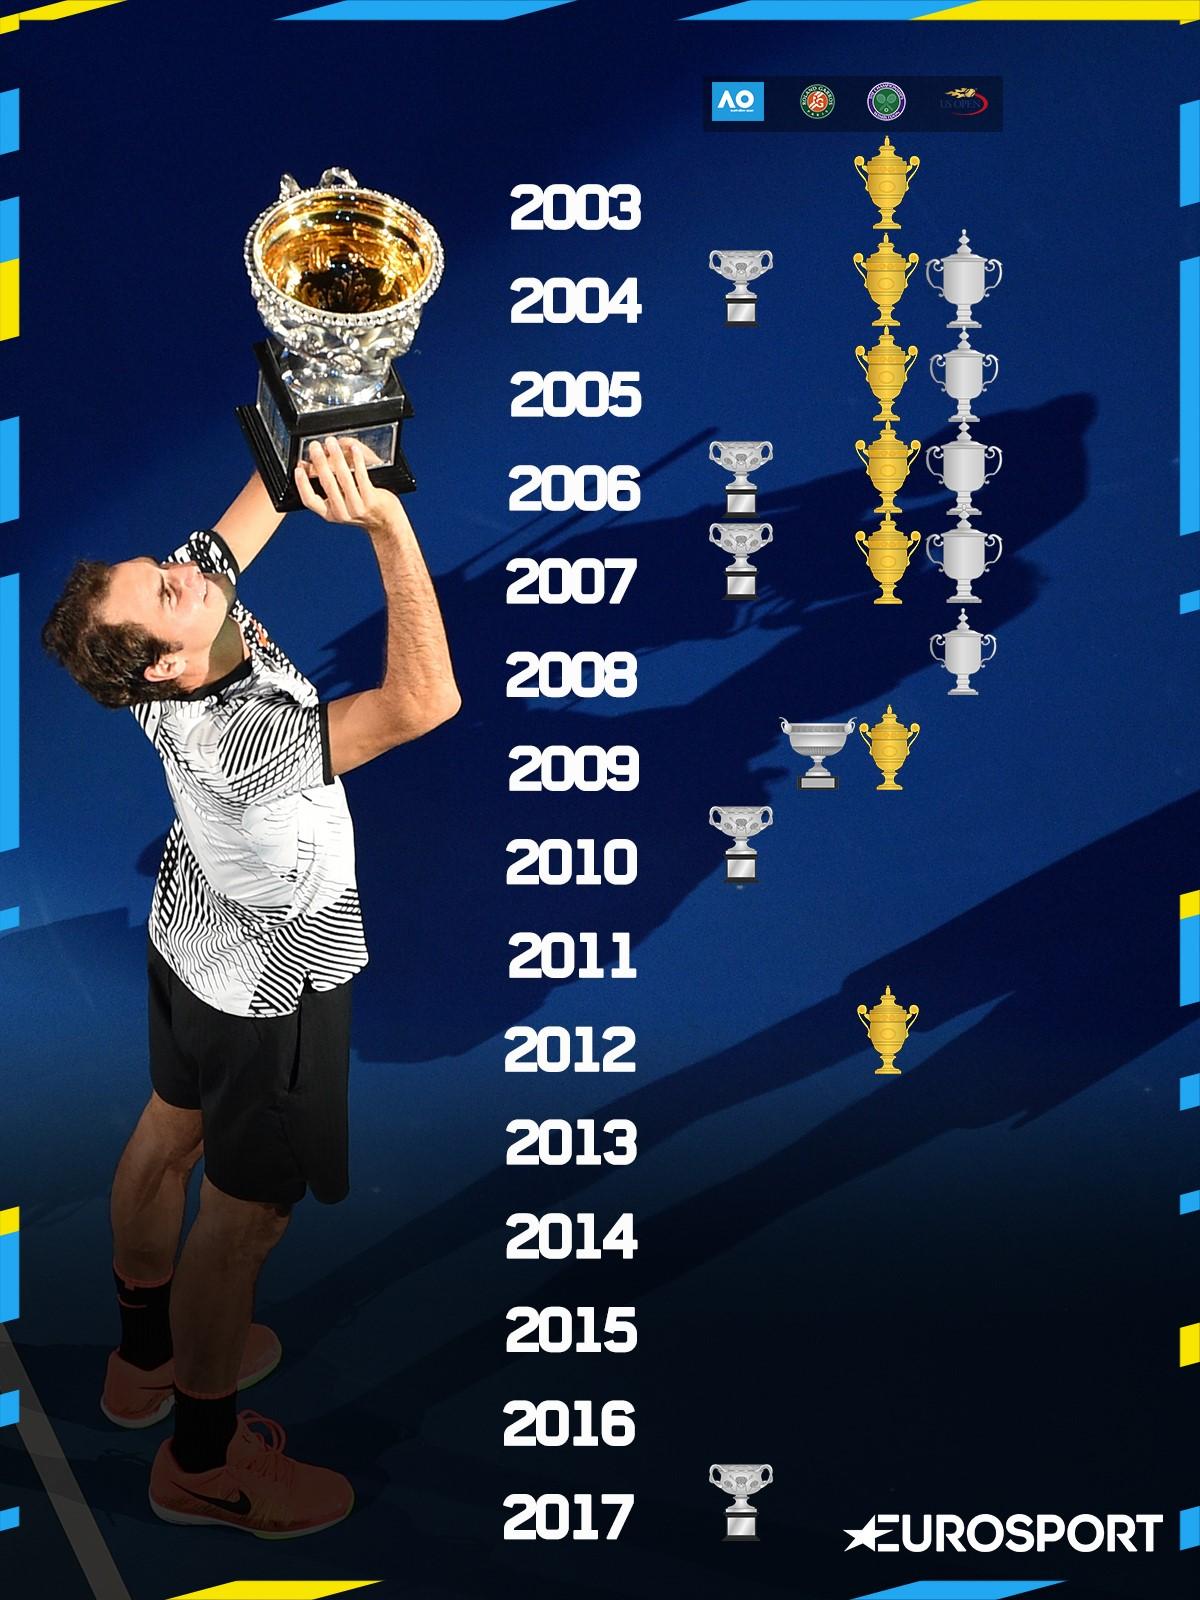 Roger Federer - son palmarès